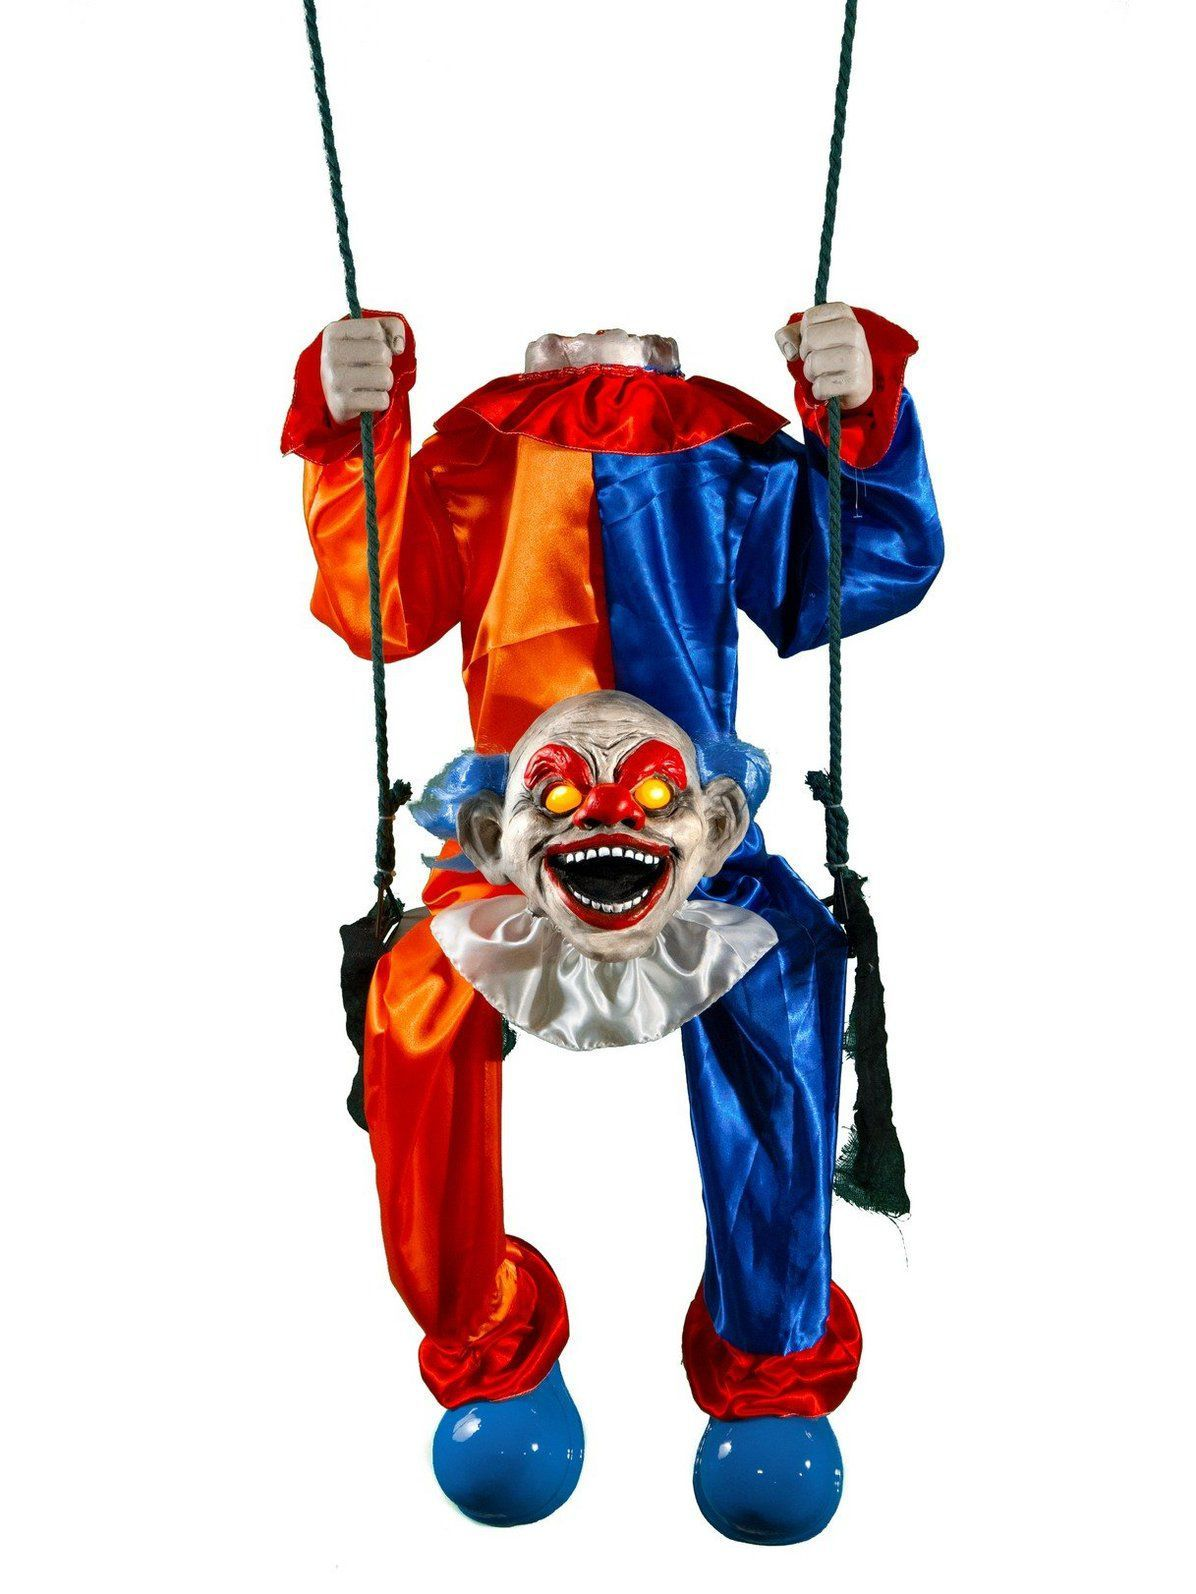 Animated Headless Clown On Swing Animated halloween